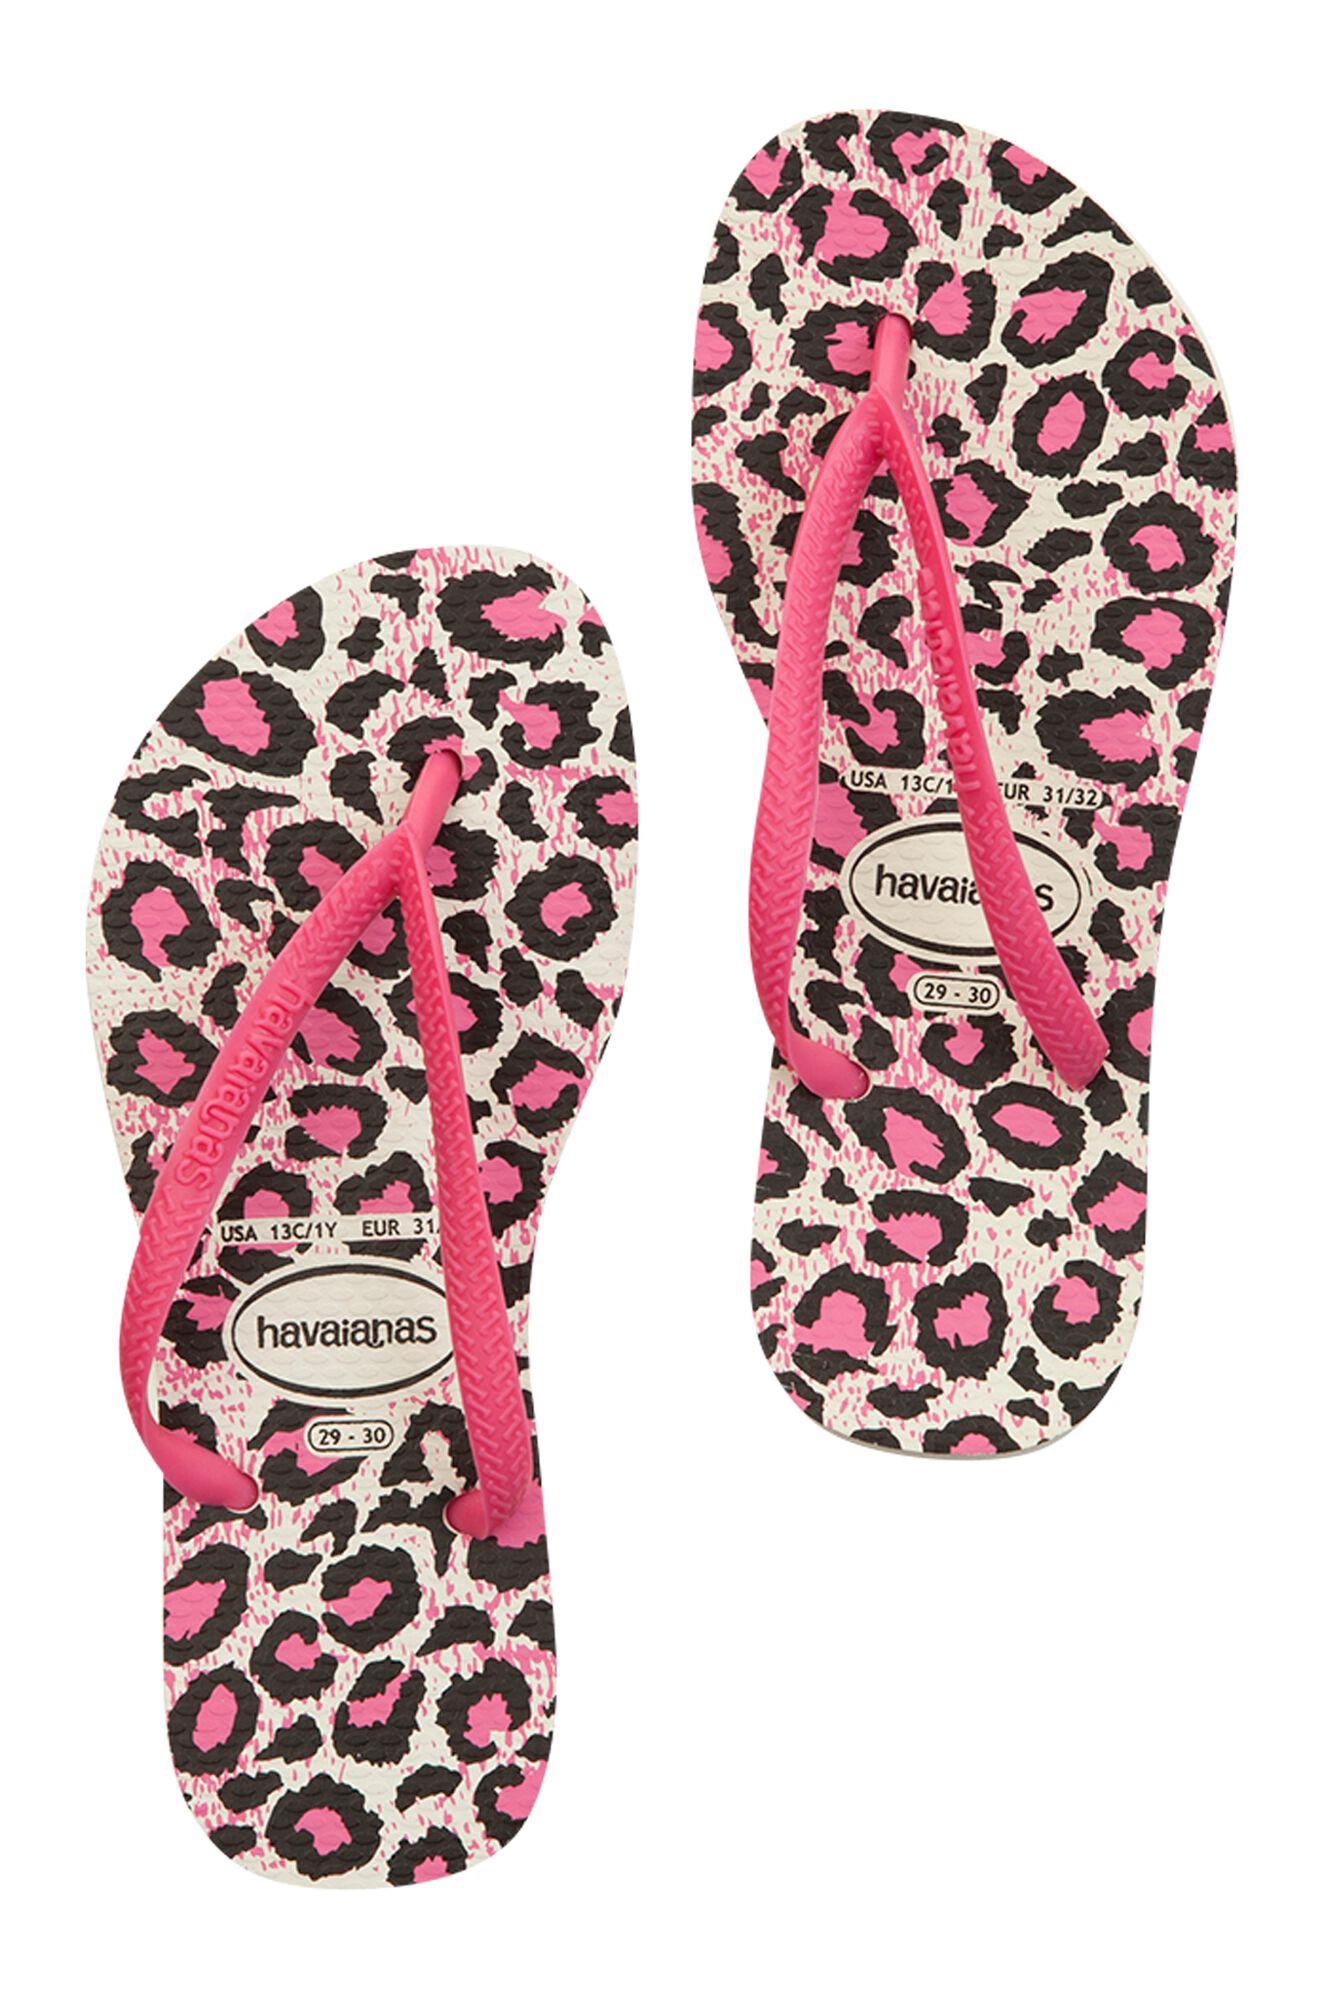 ef99b17b10e5 Boys · Shoes · Flip Flops. Havaianas slim. Previous Next